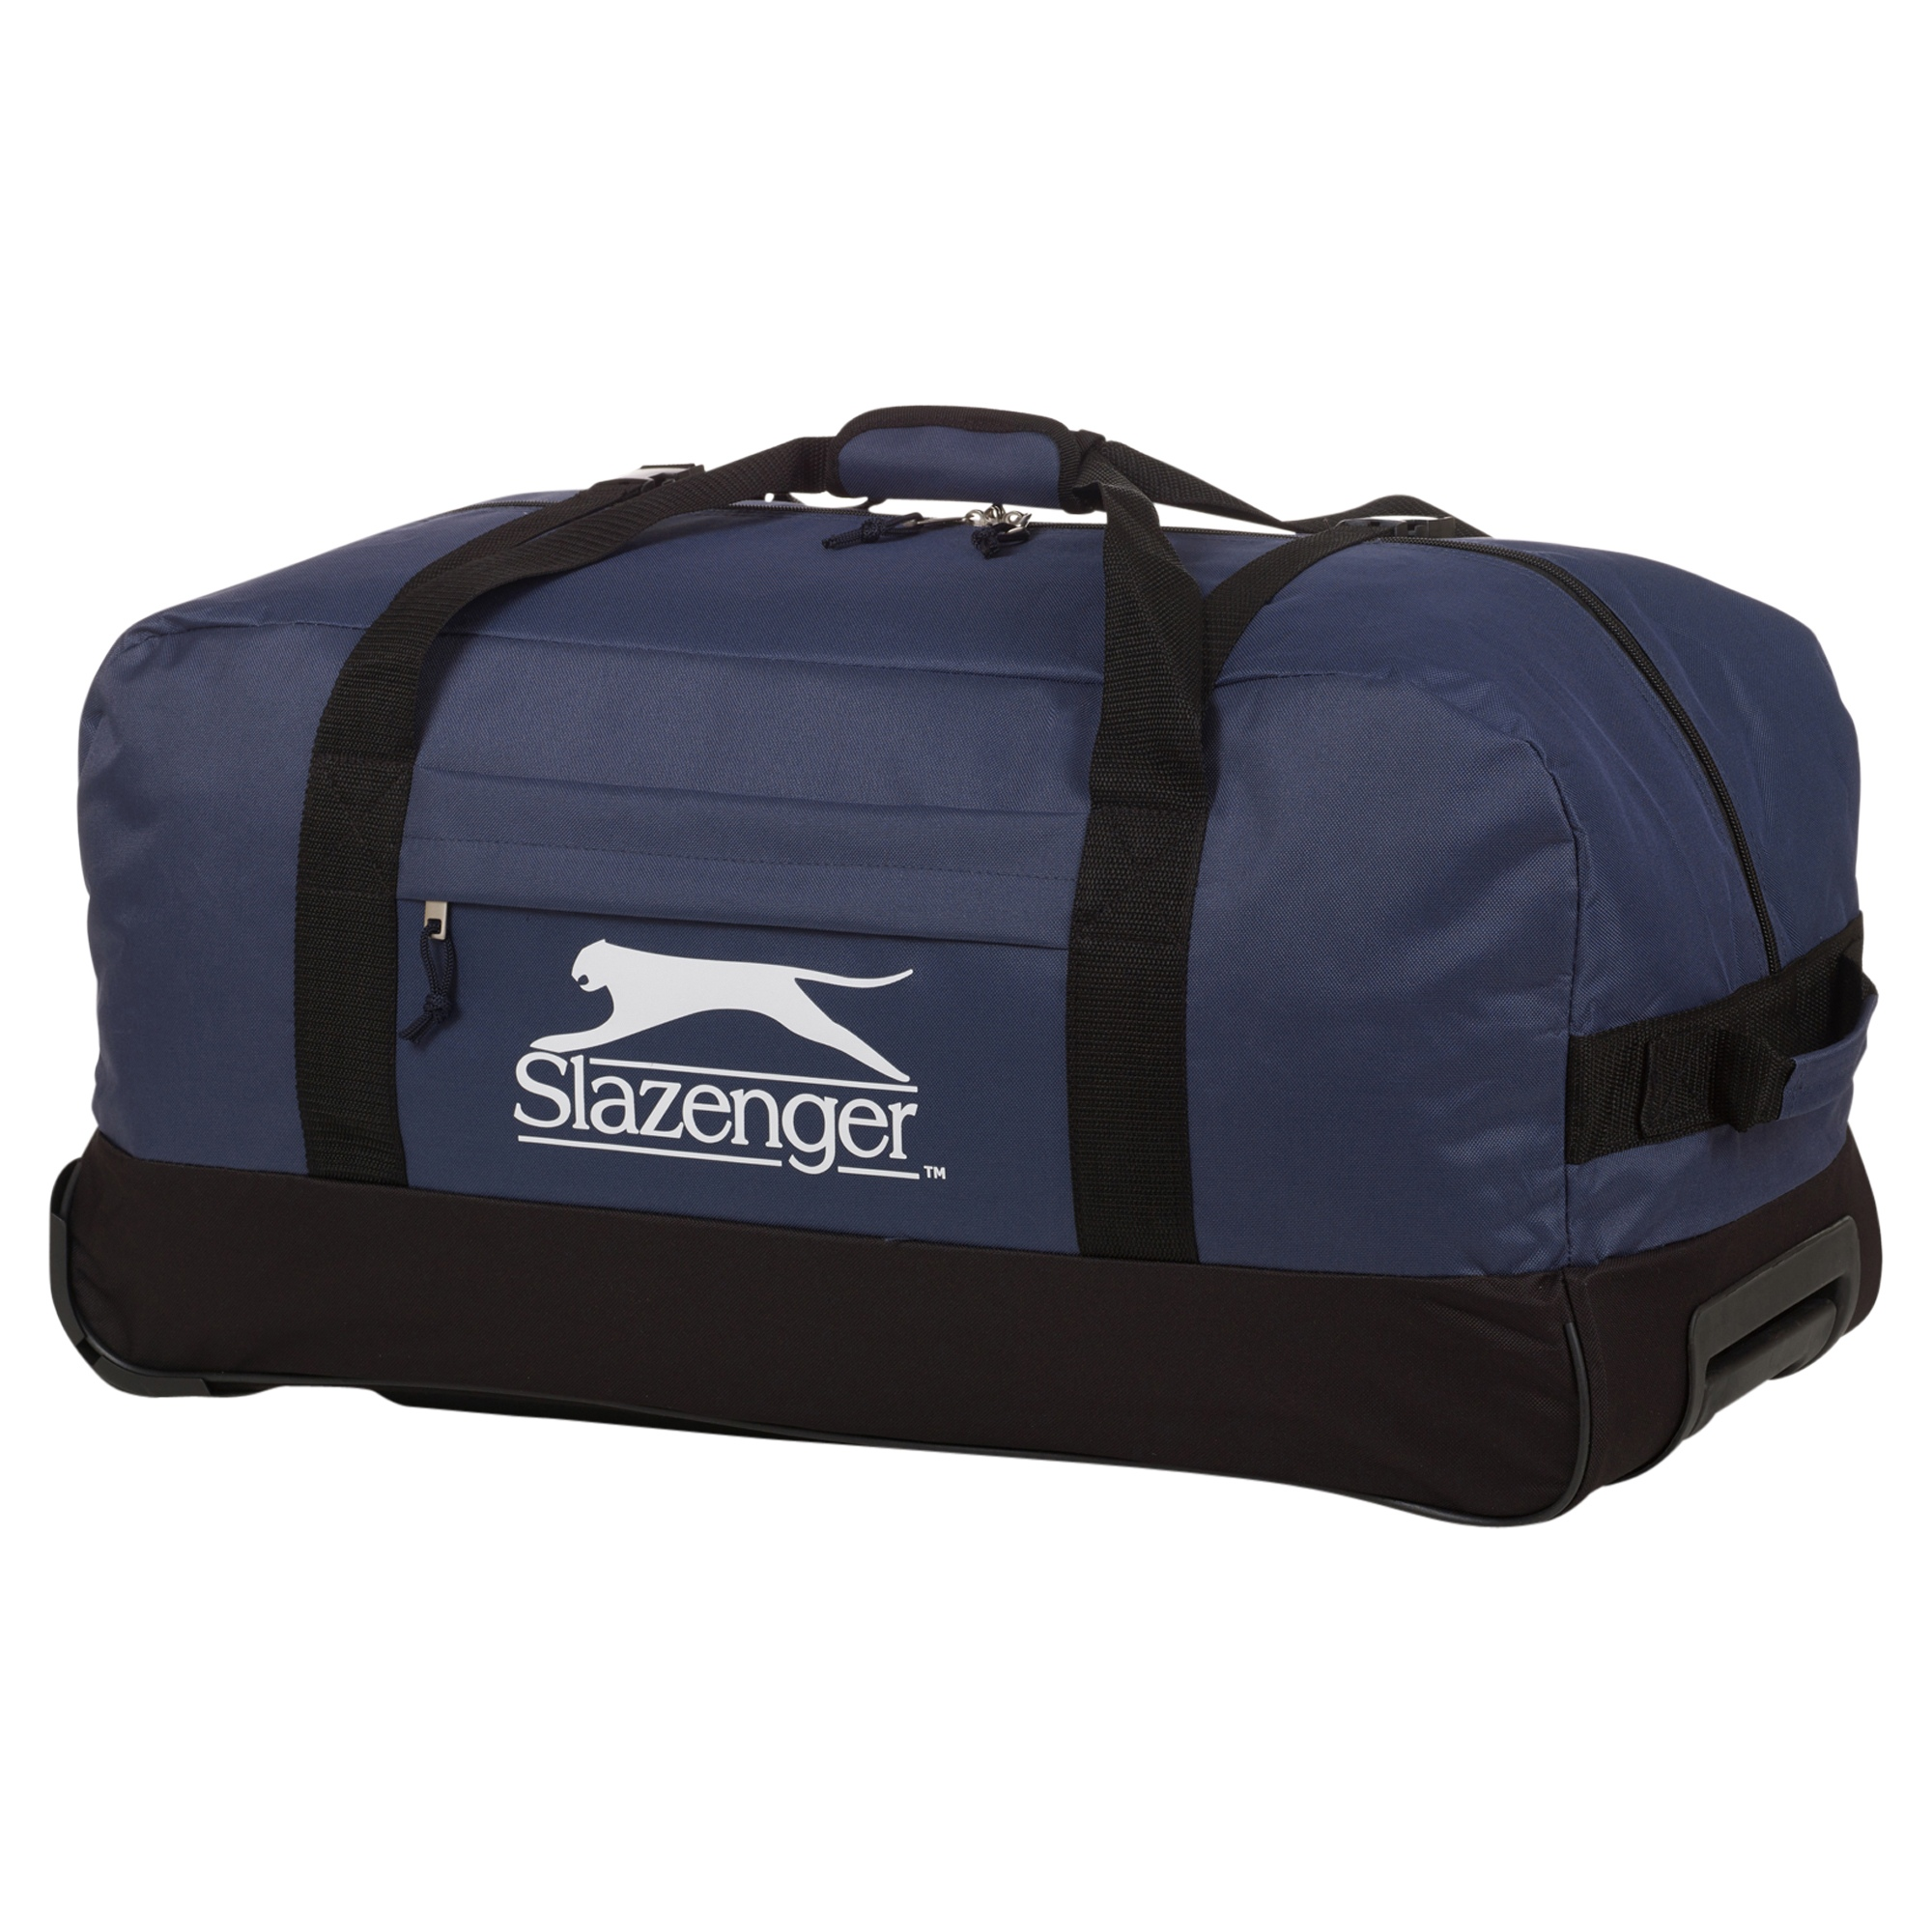 Slazenger Trolley Sports Bag 73x30x33 412597 3199